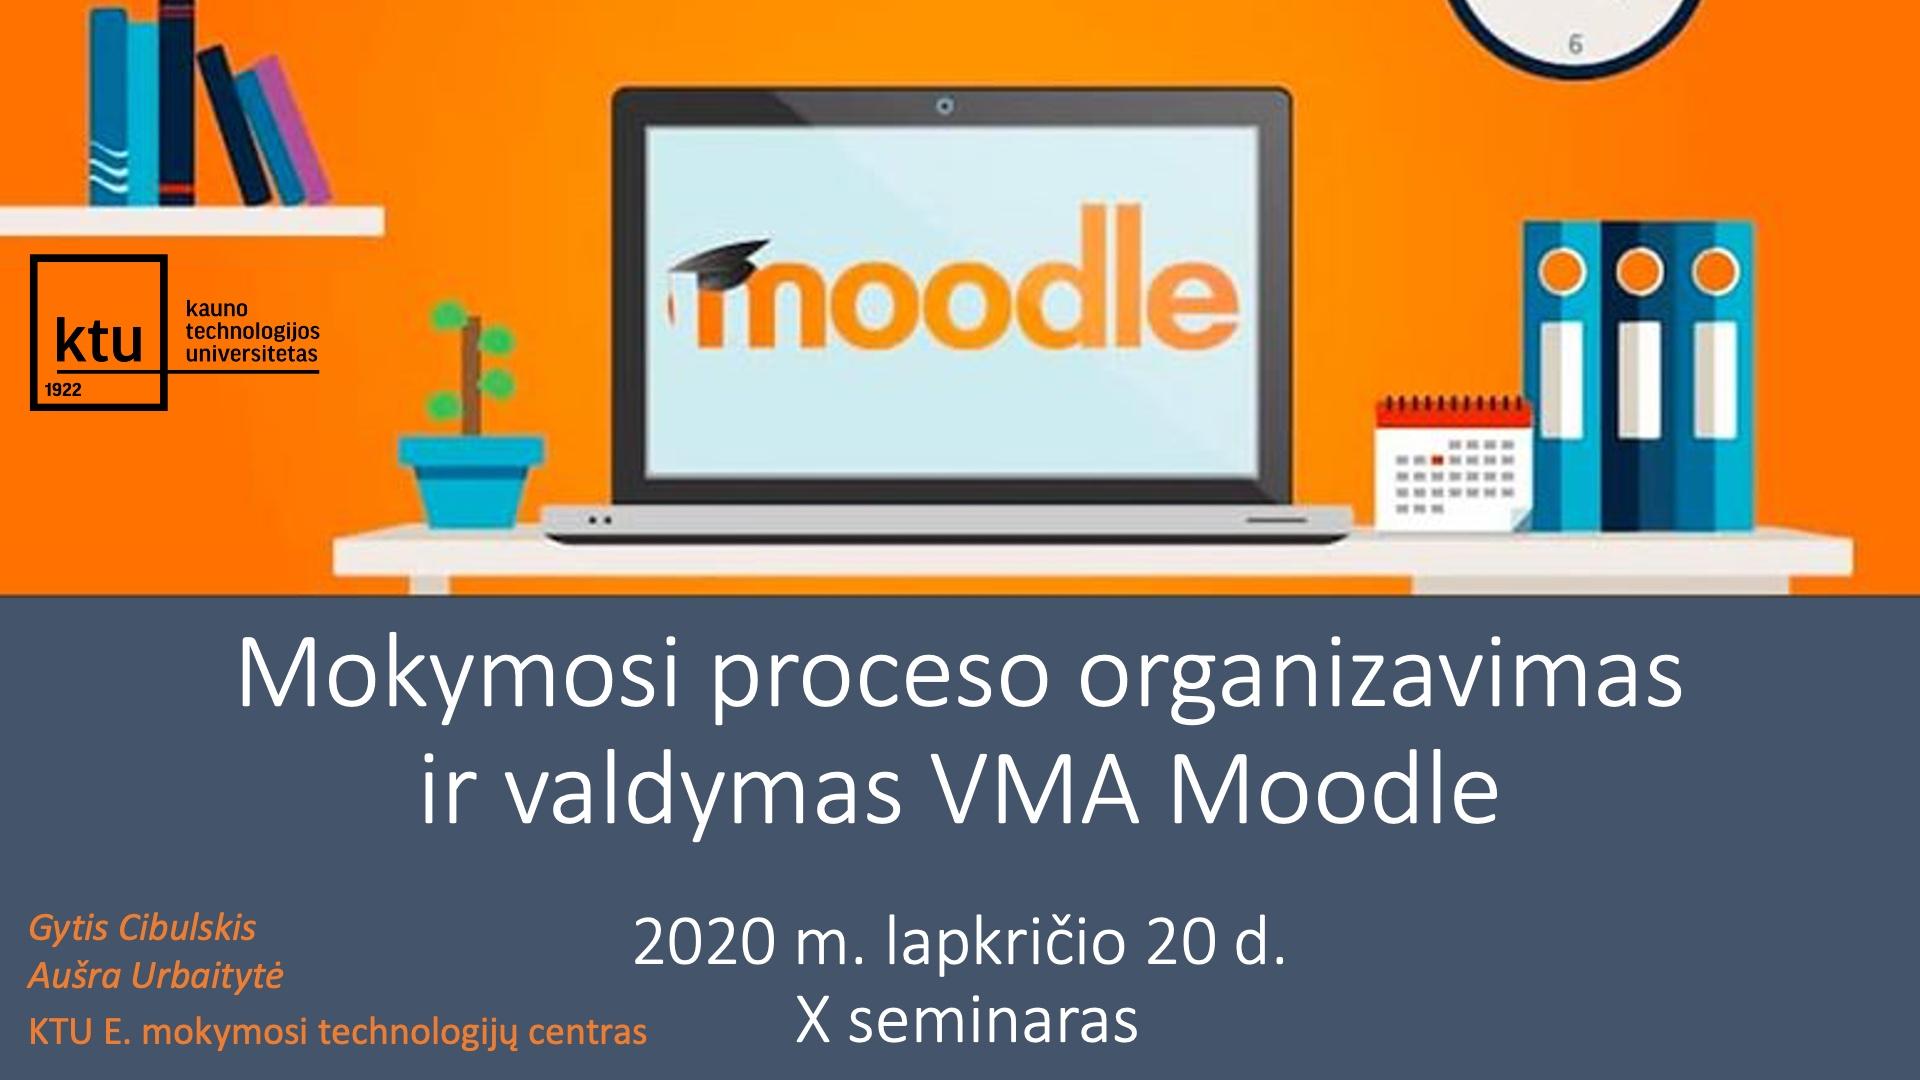 2020.11.20 Moodle mokymai (X seminaras)